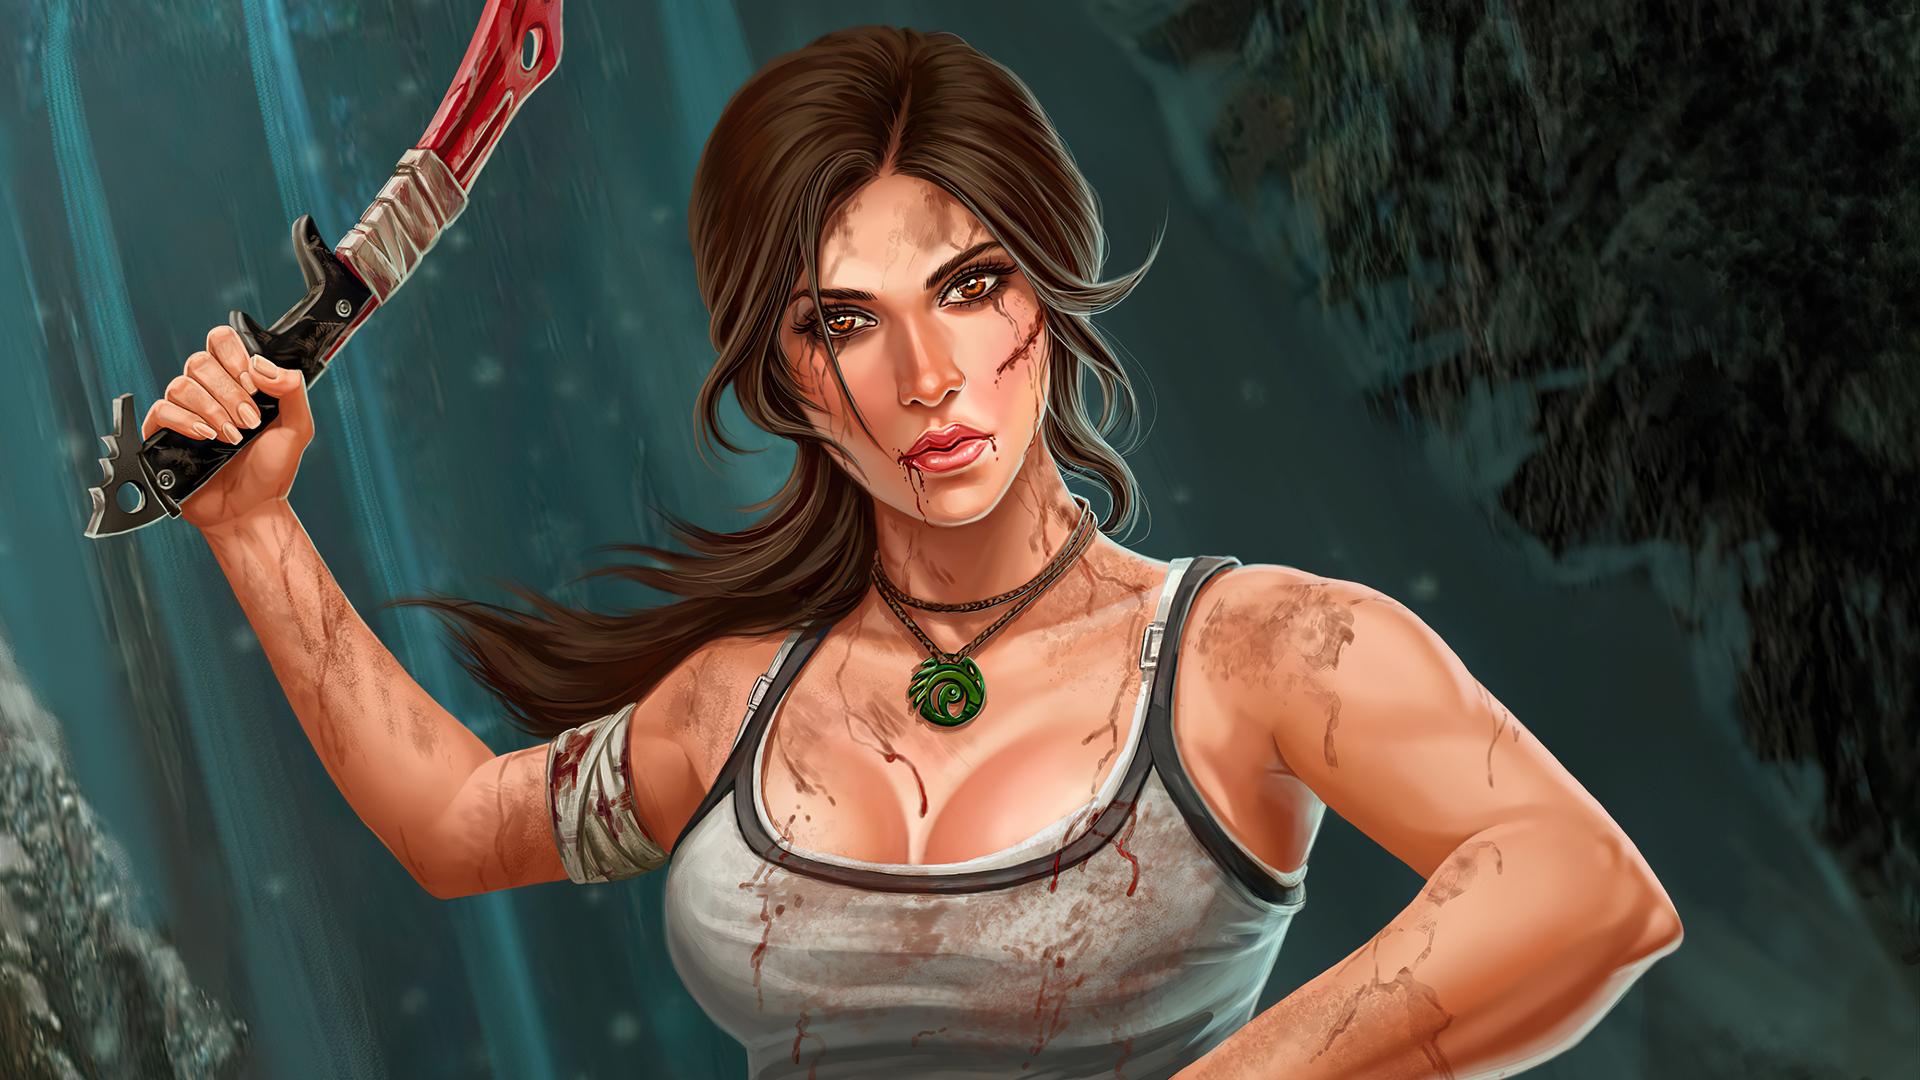 Lara Croft HD Wallpaper for iphone - Usefulcraft.com